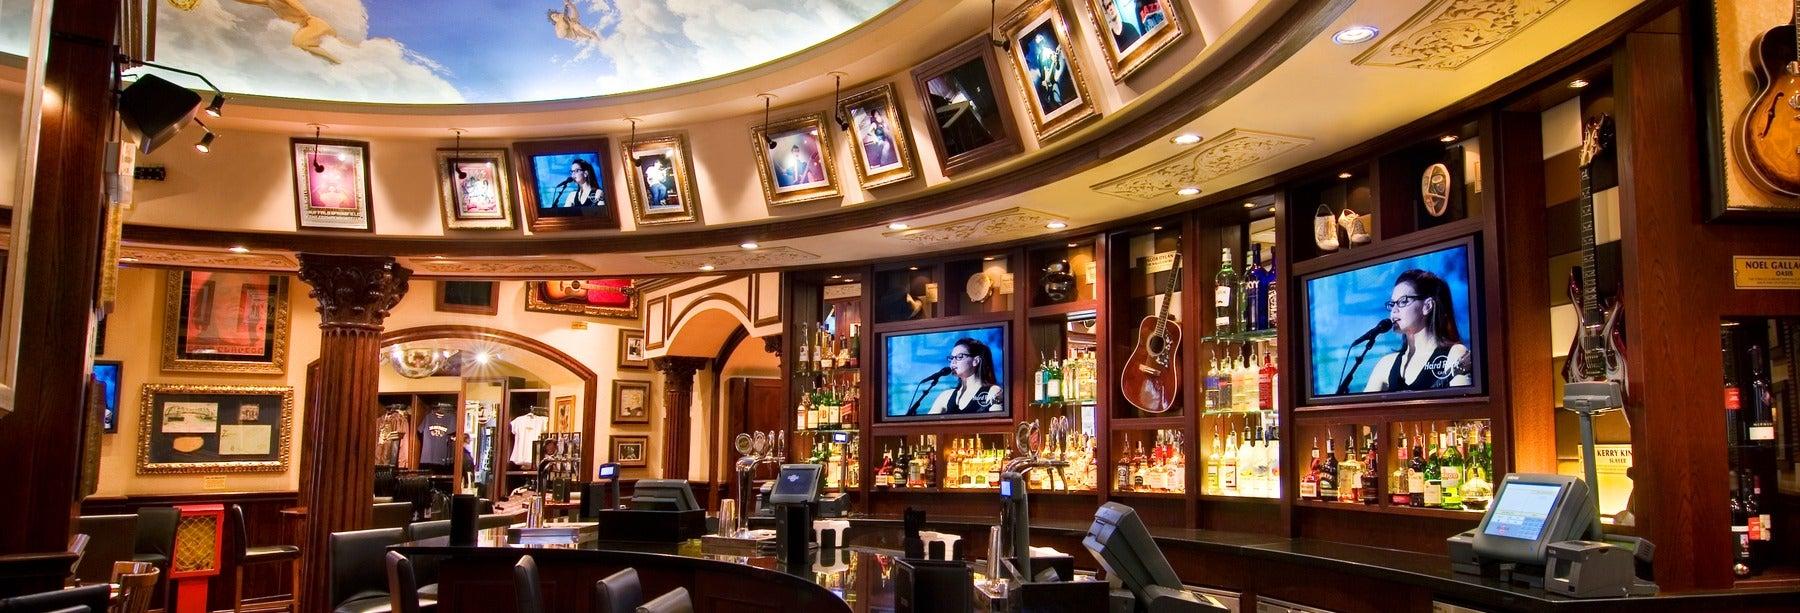 Déjeuner ou dîner au Hard Rock Cafe Rome